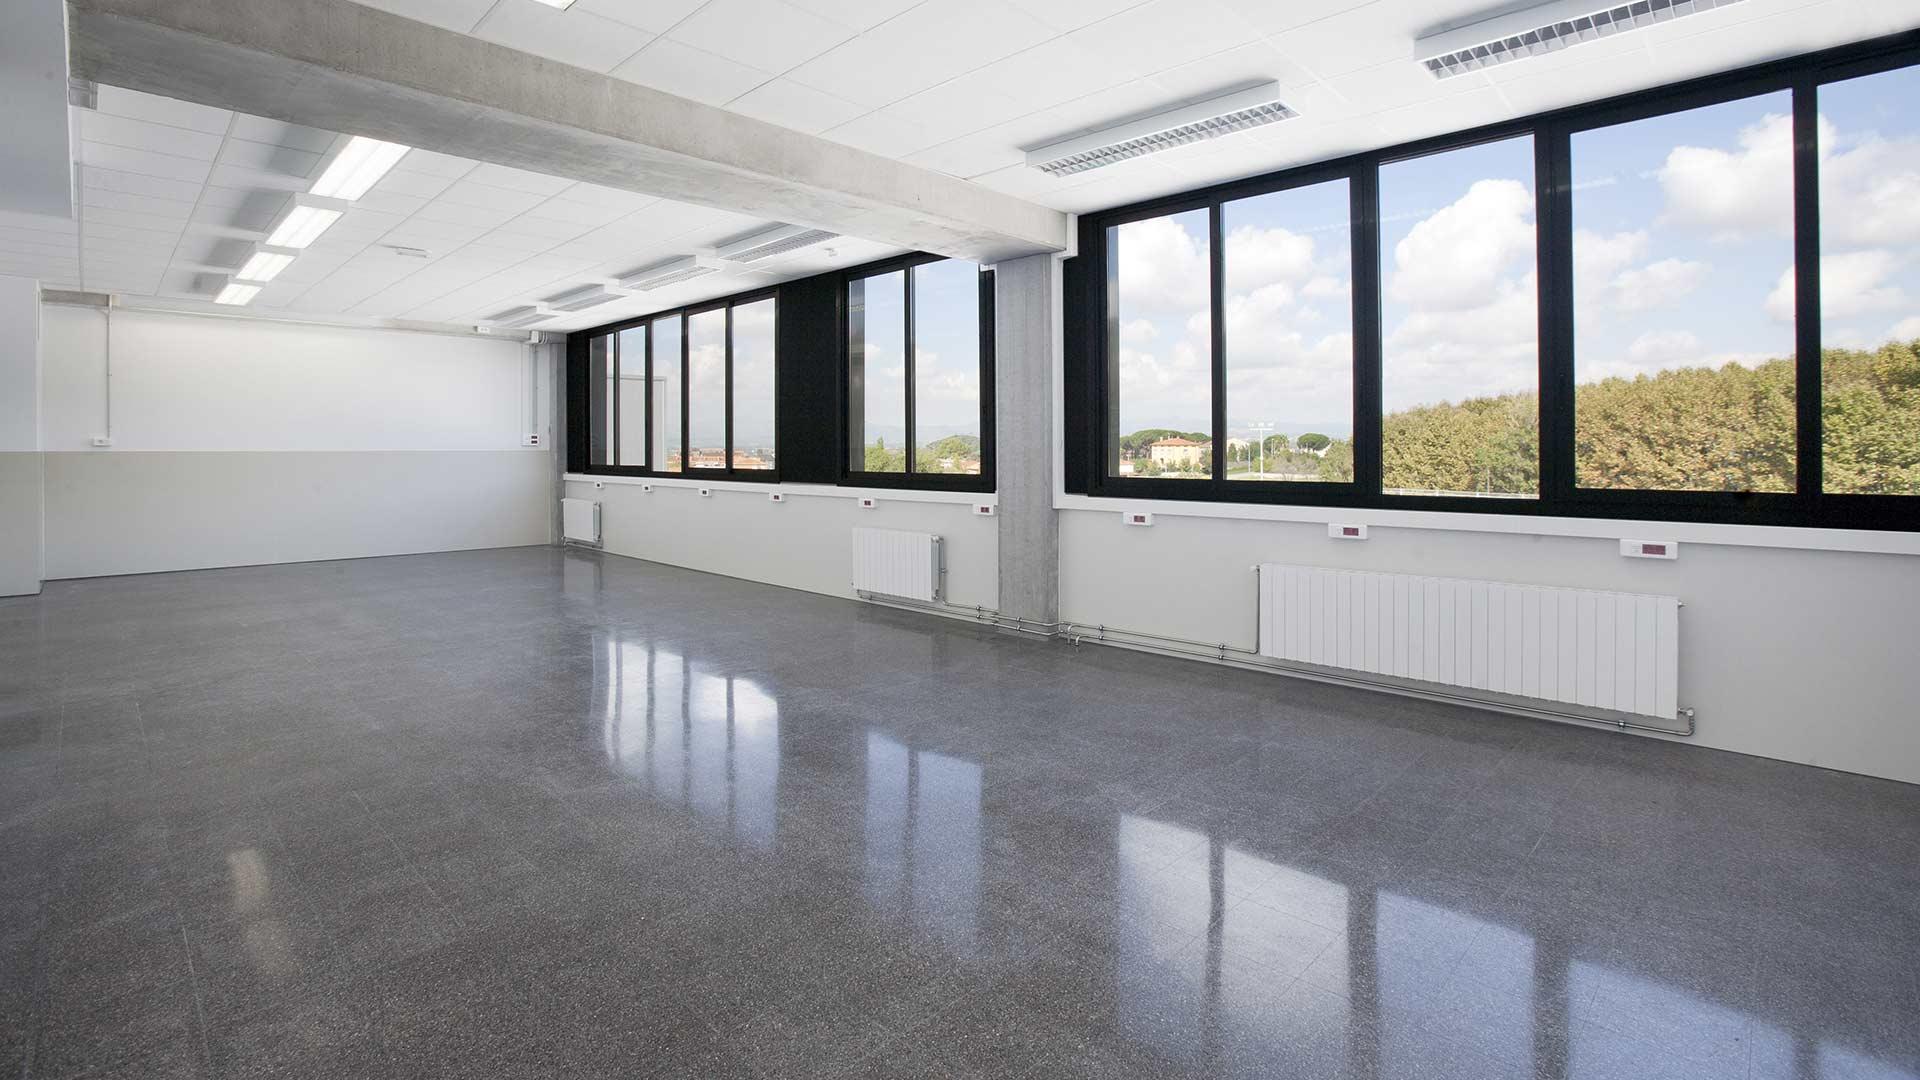 prefabricats-pujol-terratzo-paviment-escoles-montornes-6